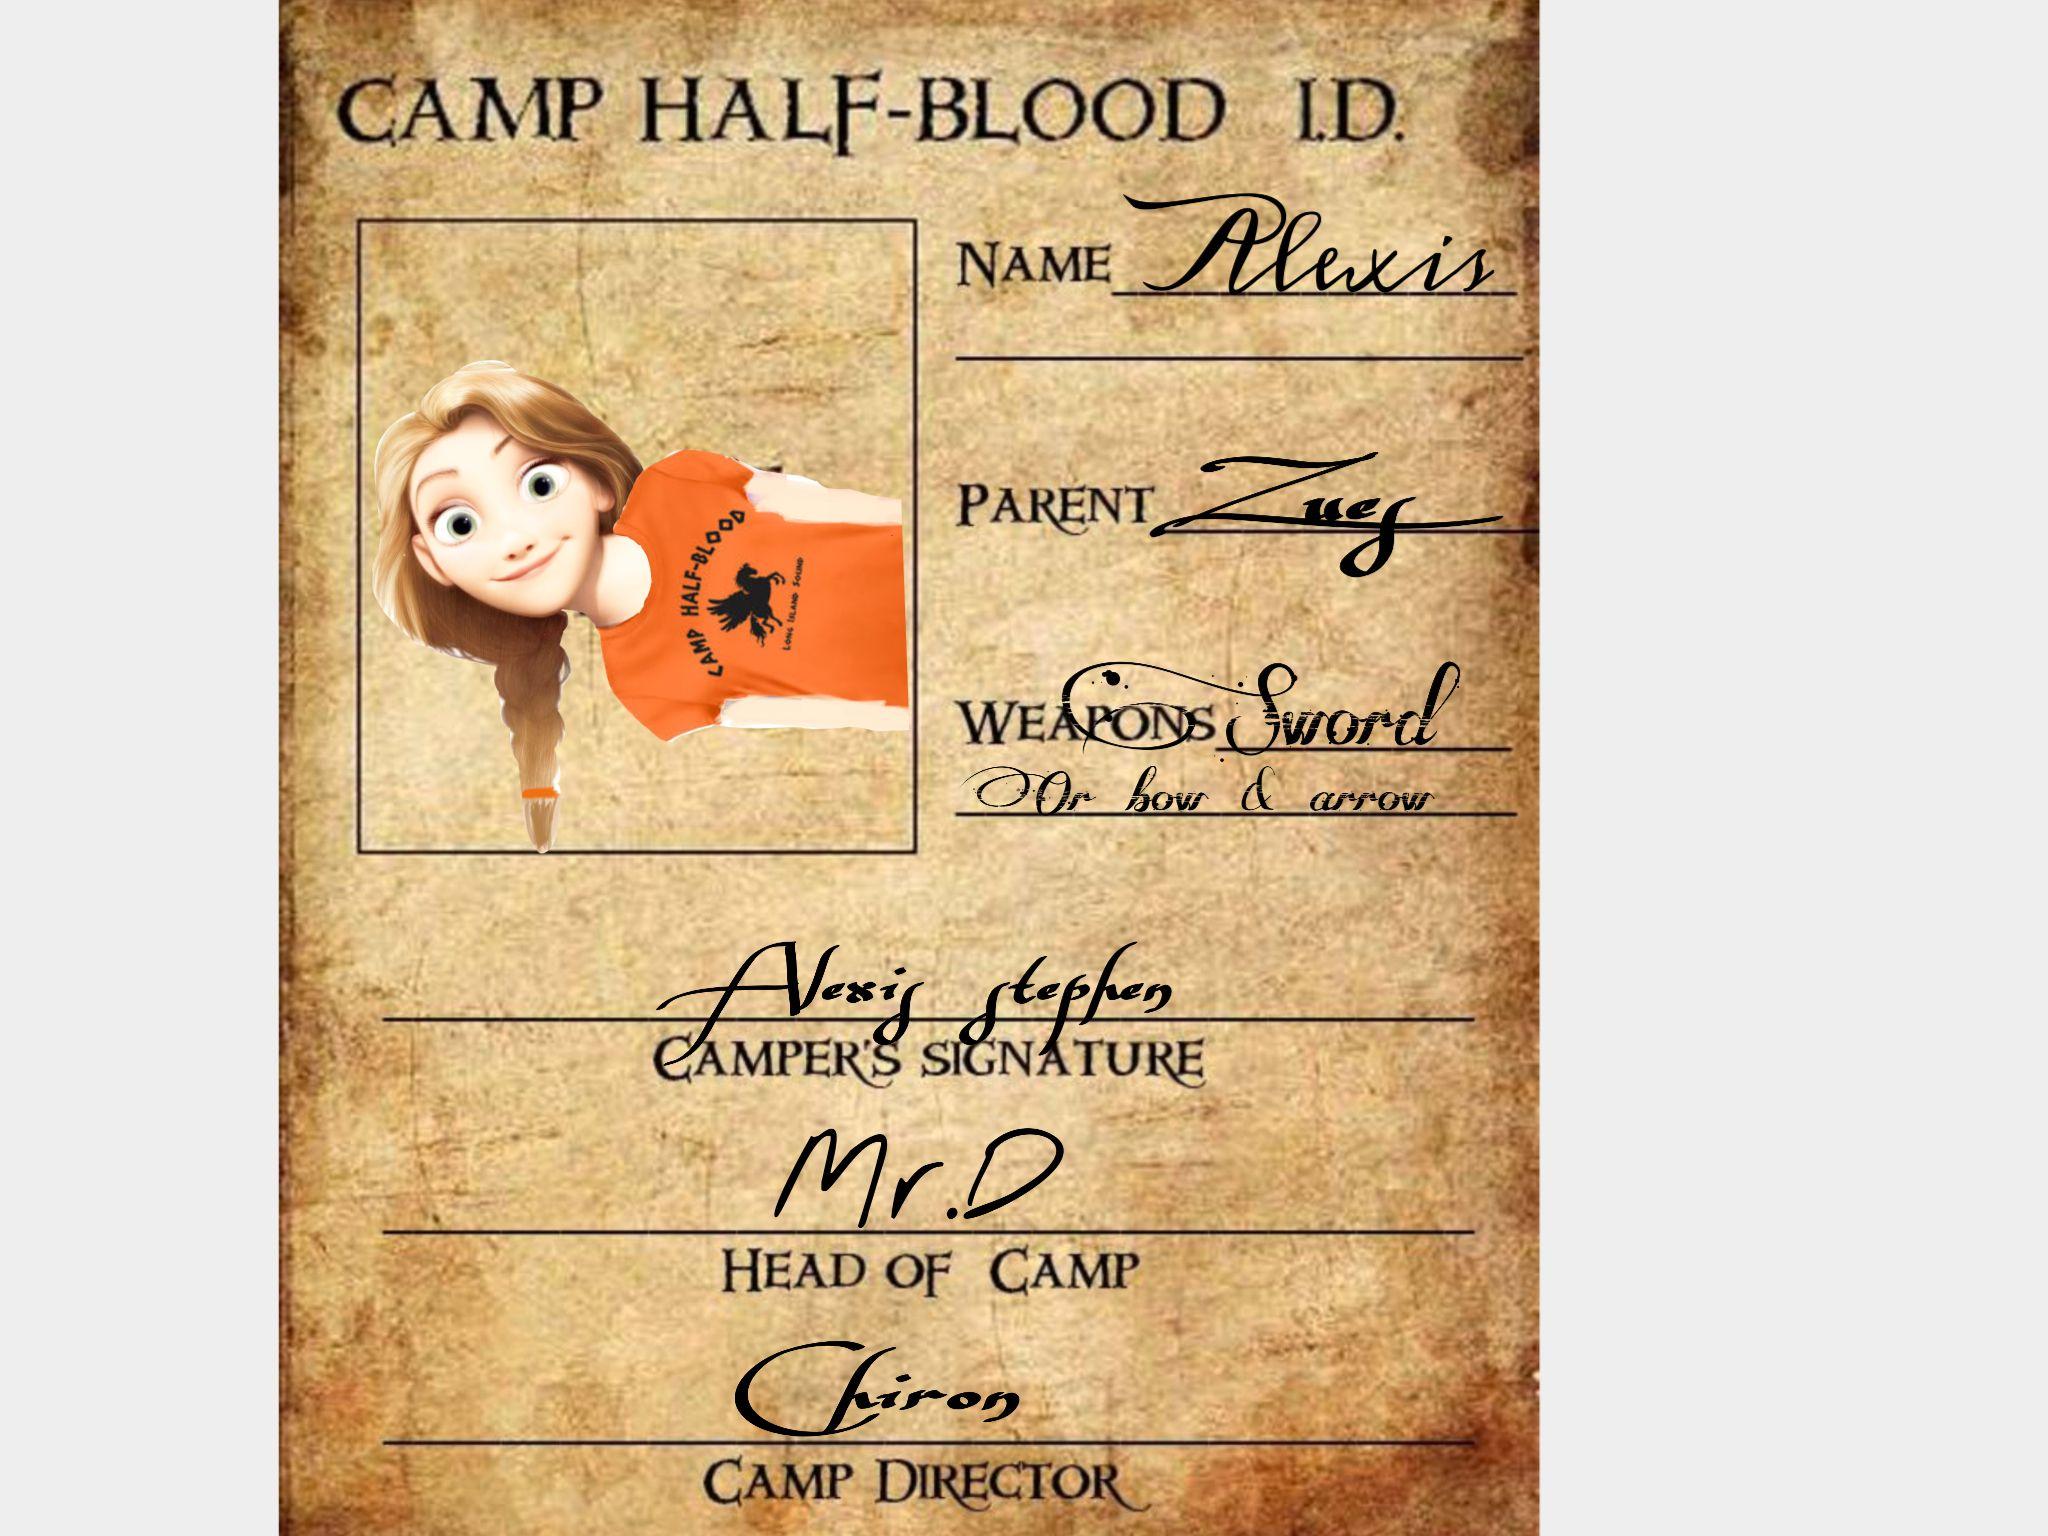 My Camp Half Blood Id